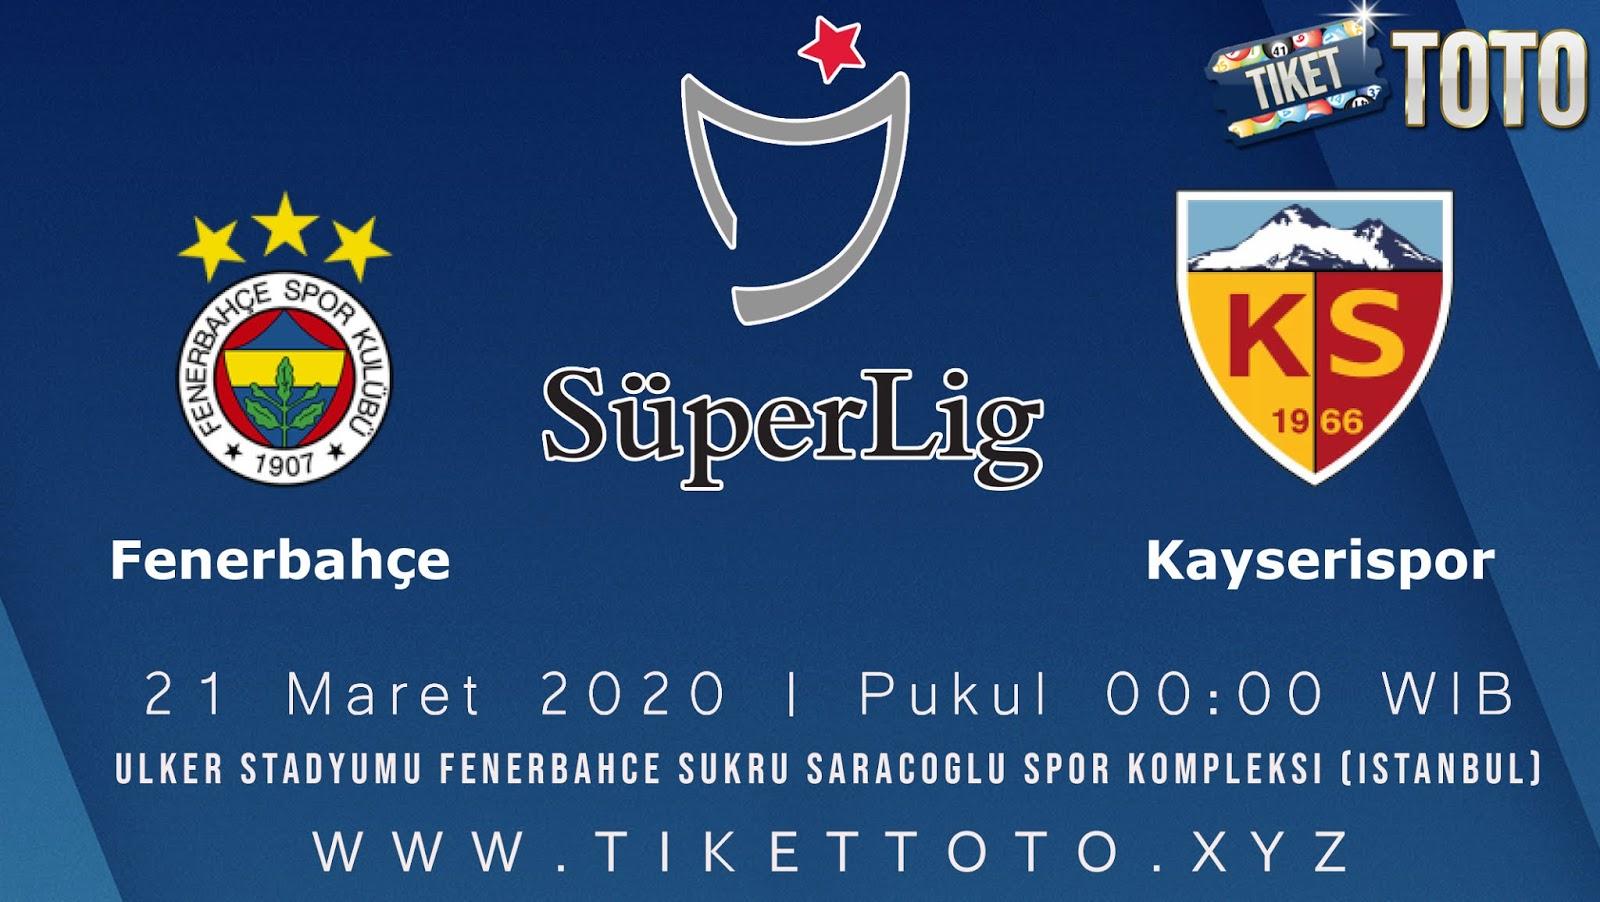 Prediksi Pertandingan Fenerbahce vs Kayserispor 21 Maret 2020